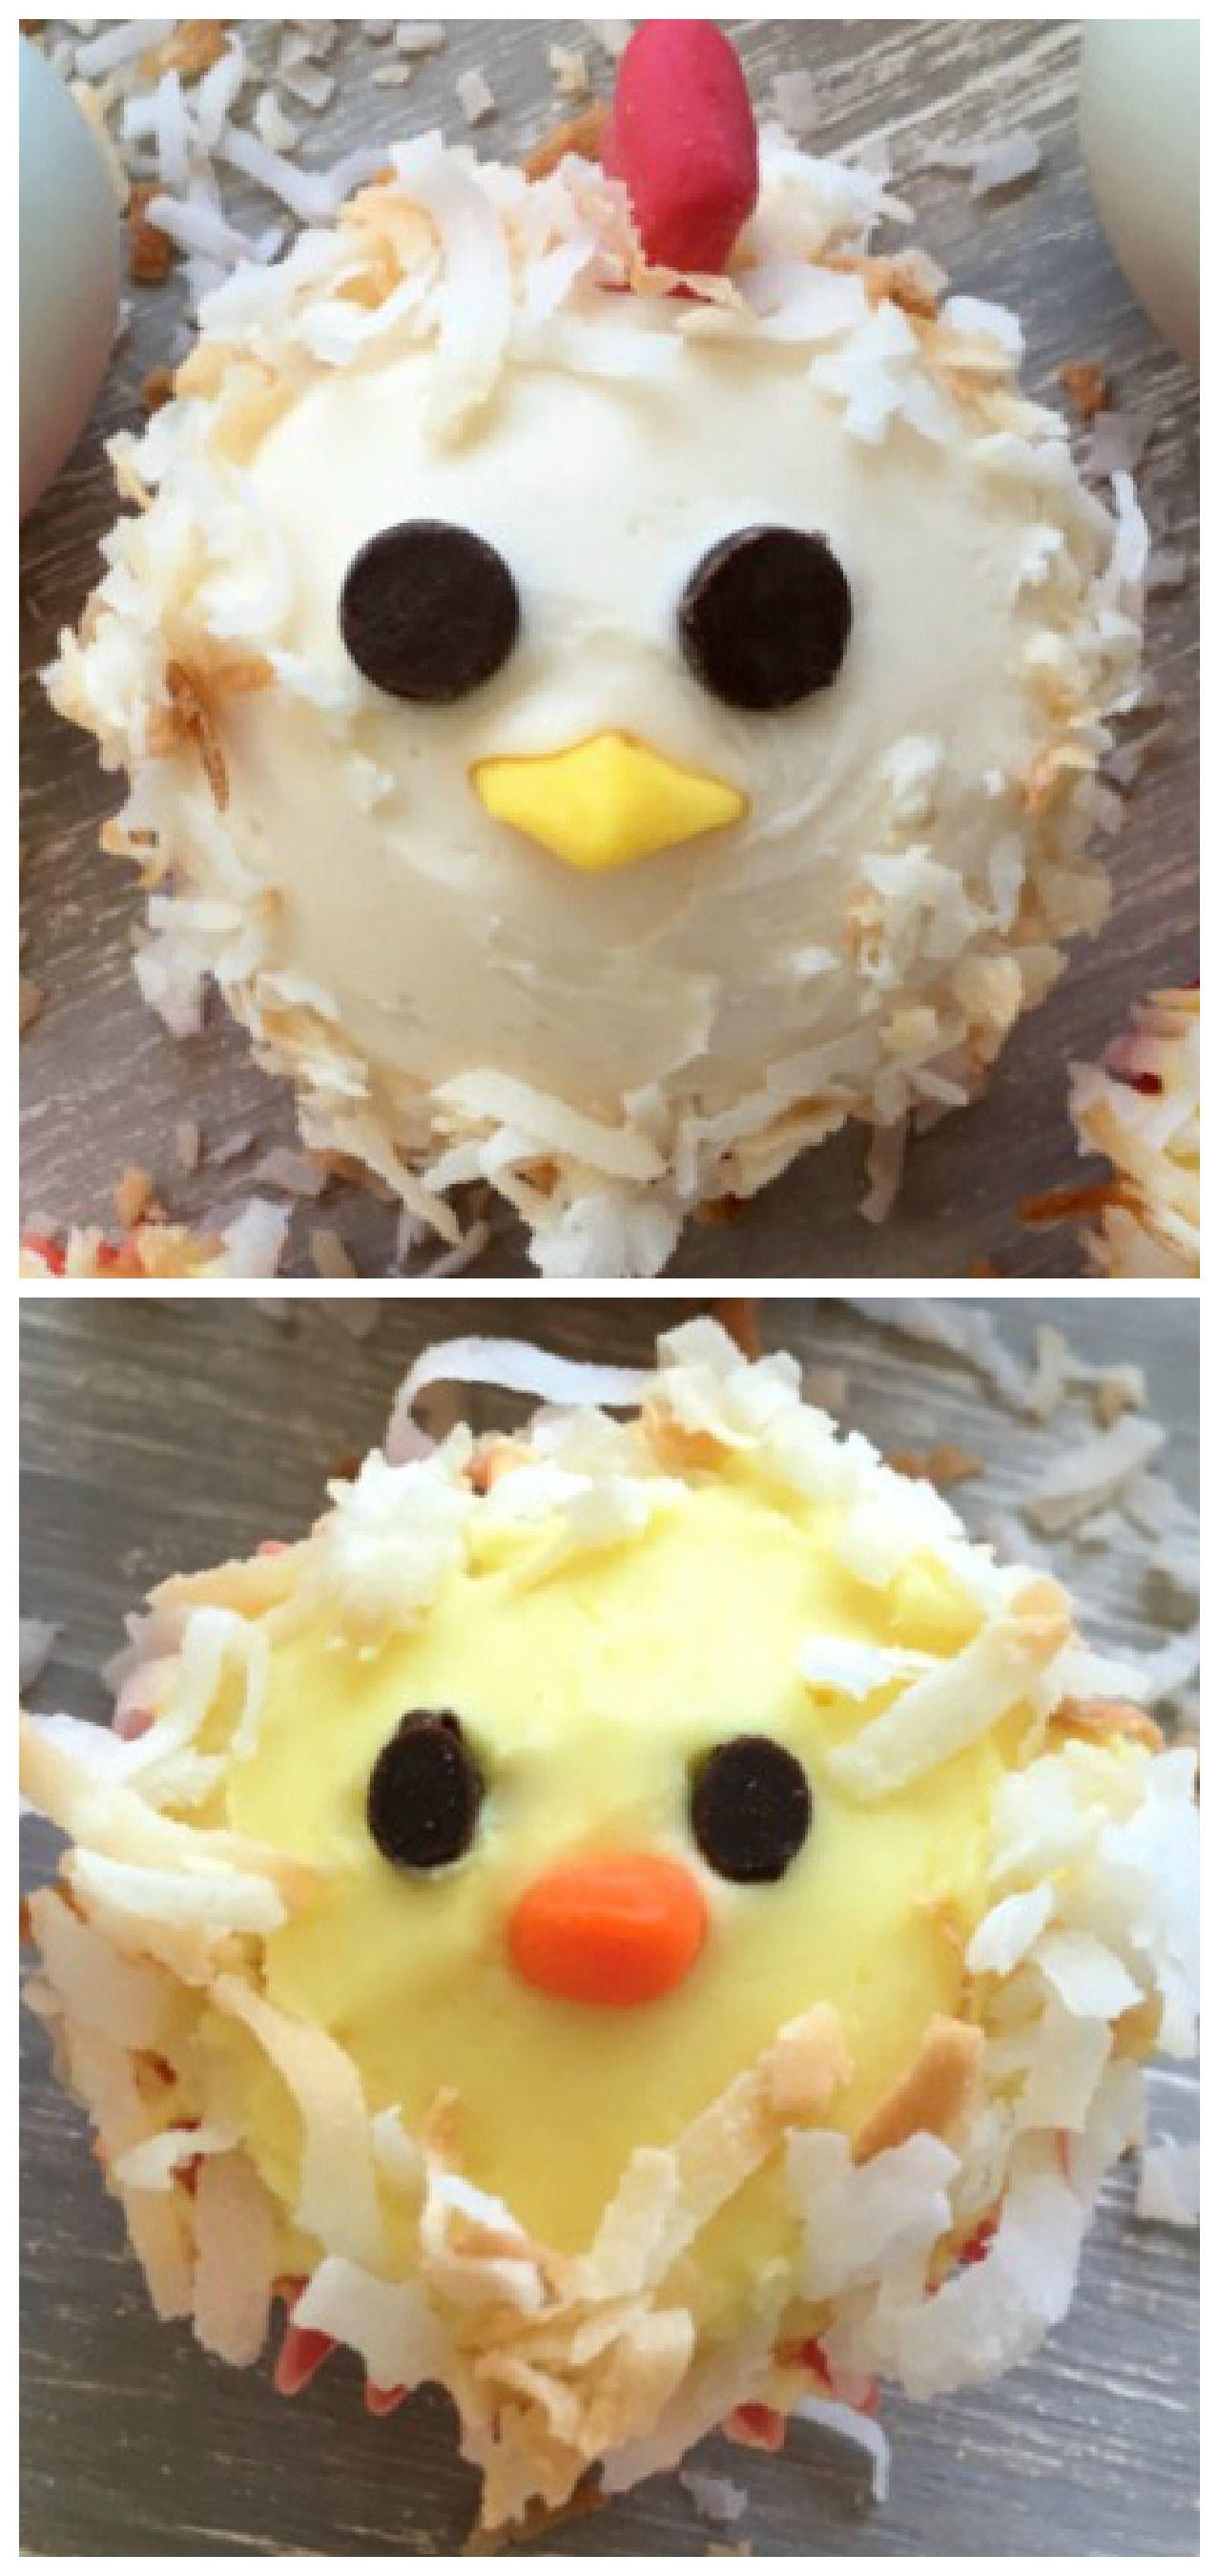 Pleasant Chicken Cupcakes Recipe Cute Birthday Cakes Chicken Cupcakes Funny Birthday Cards Online Inifodamsfinfo